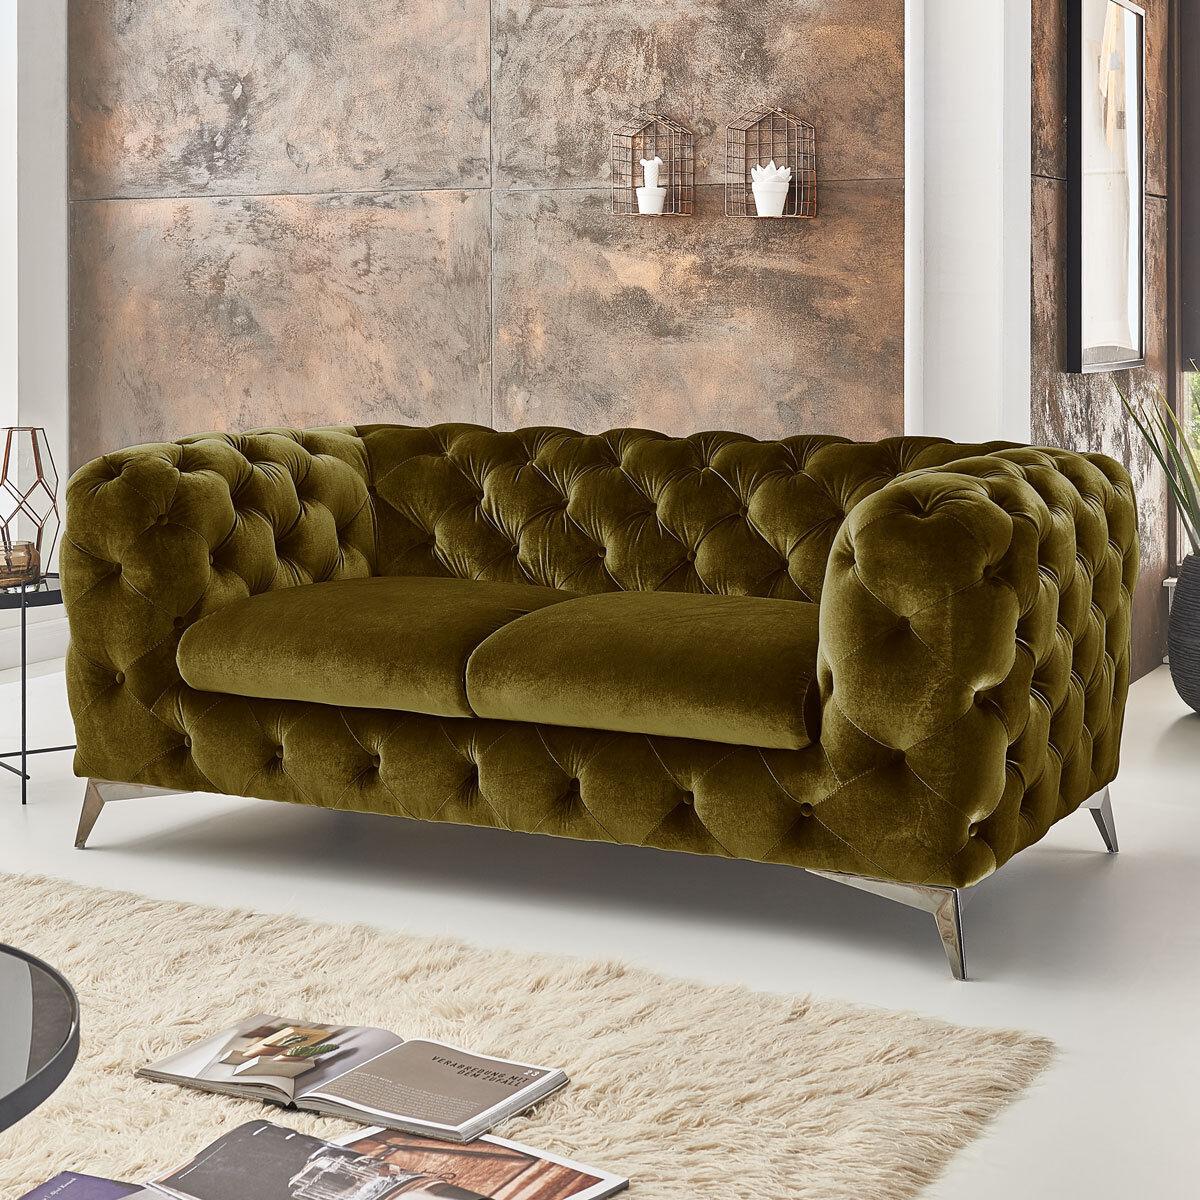 f116dee42 moebella designer chesterfield sofas couch samt ...